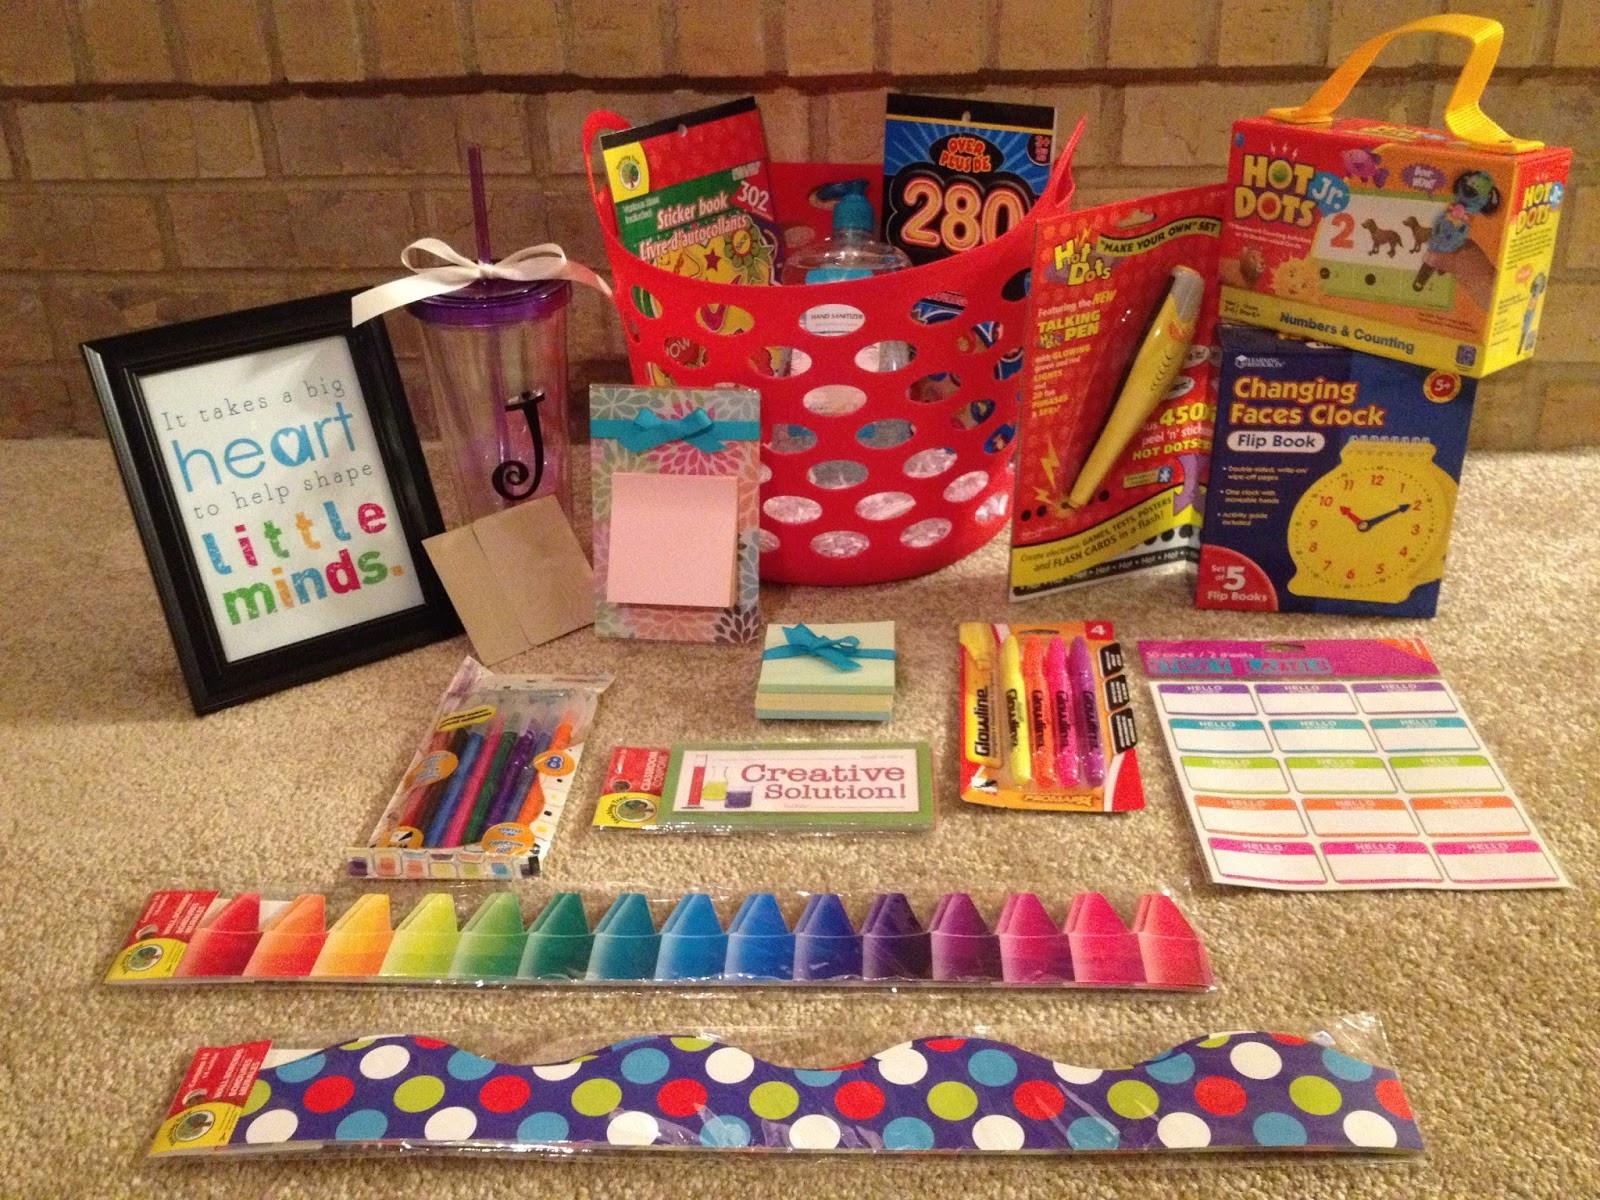 New Teacher Gift Basket Ideas  Sugar & Spice DIY Teacher Gift Basket